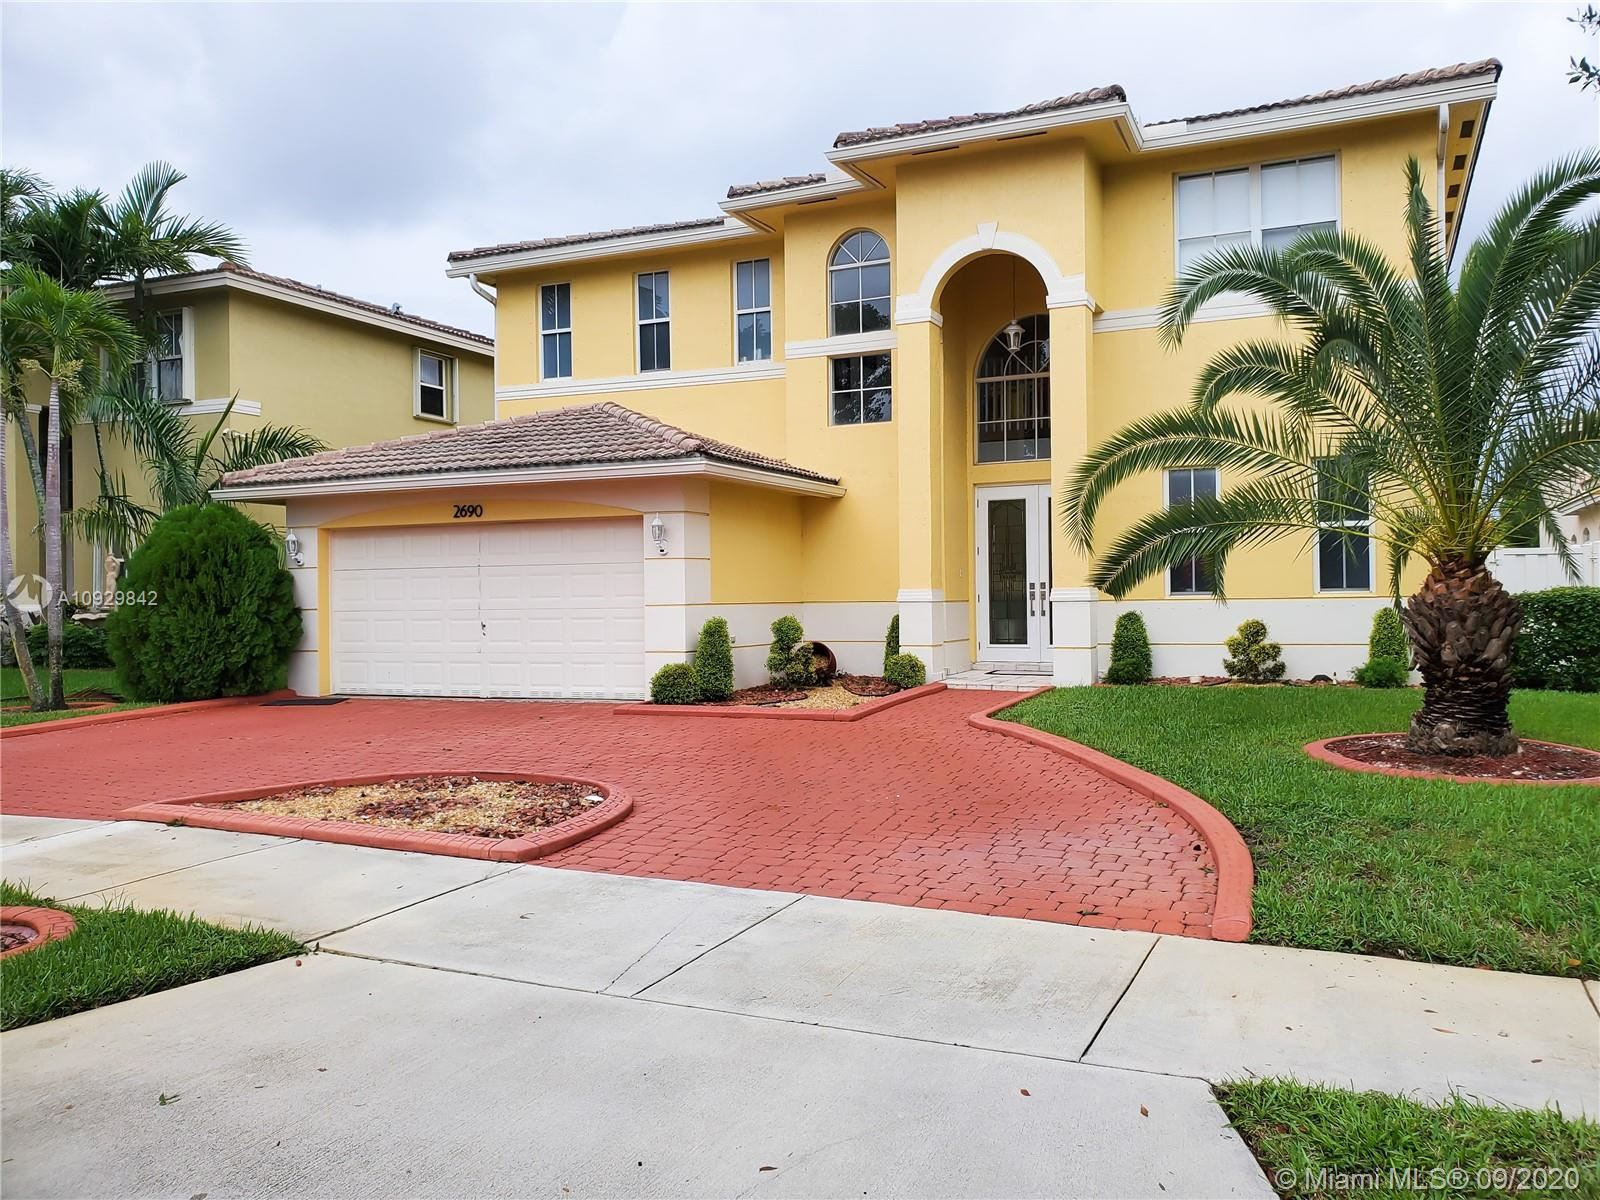 Photo of 2690 SW 138th Ave, Miramar, FL 33027 (MLS # A10929842)